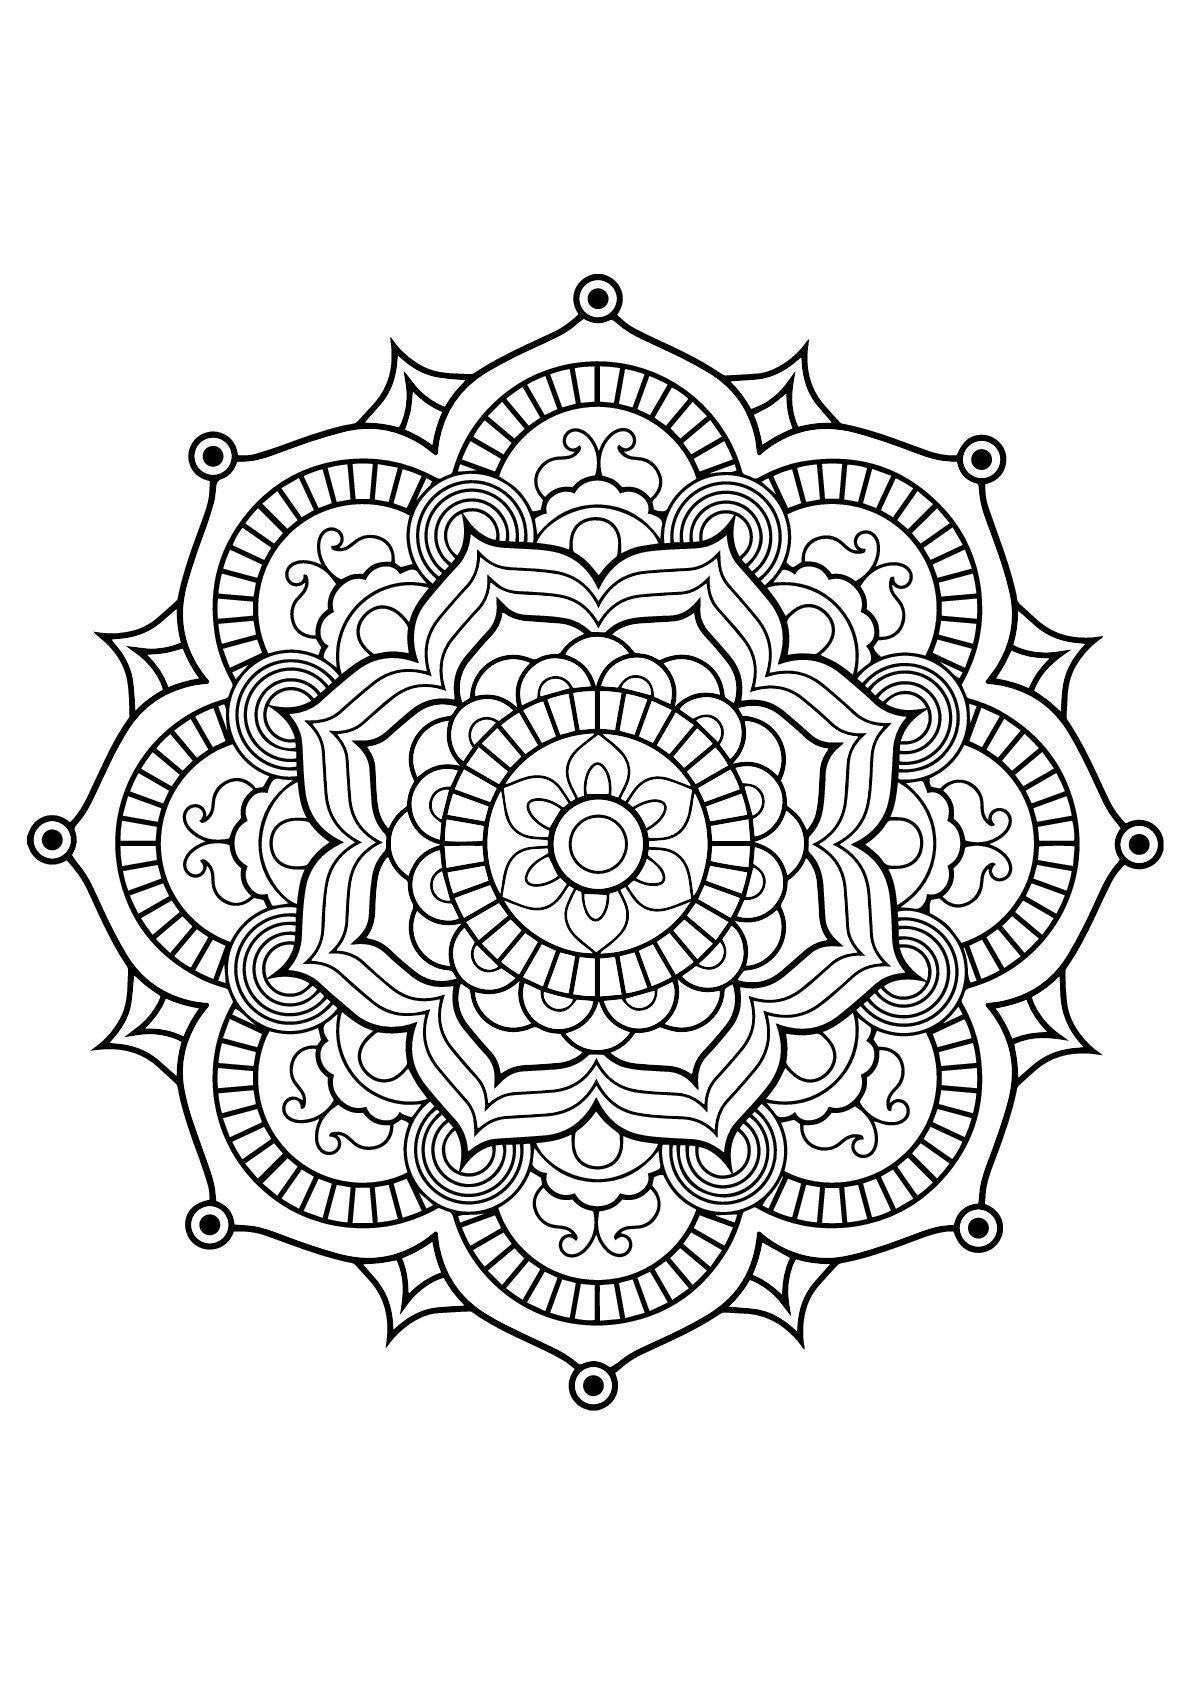 Easy Craft Ideas For The Home Kostenlose Ausmalbilder Mandalas Kinder Mandala Ausmalen